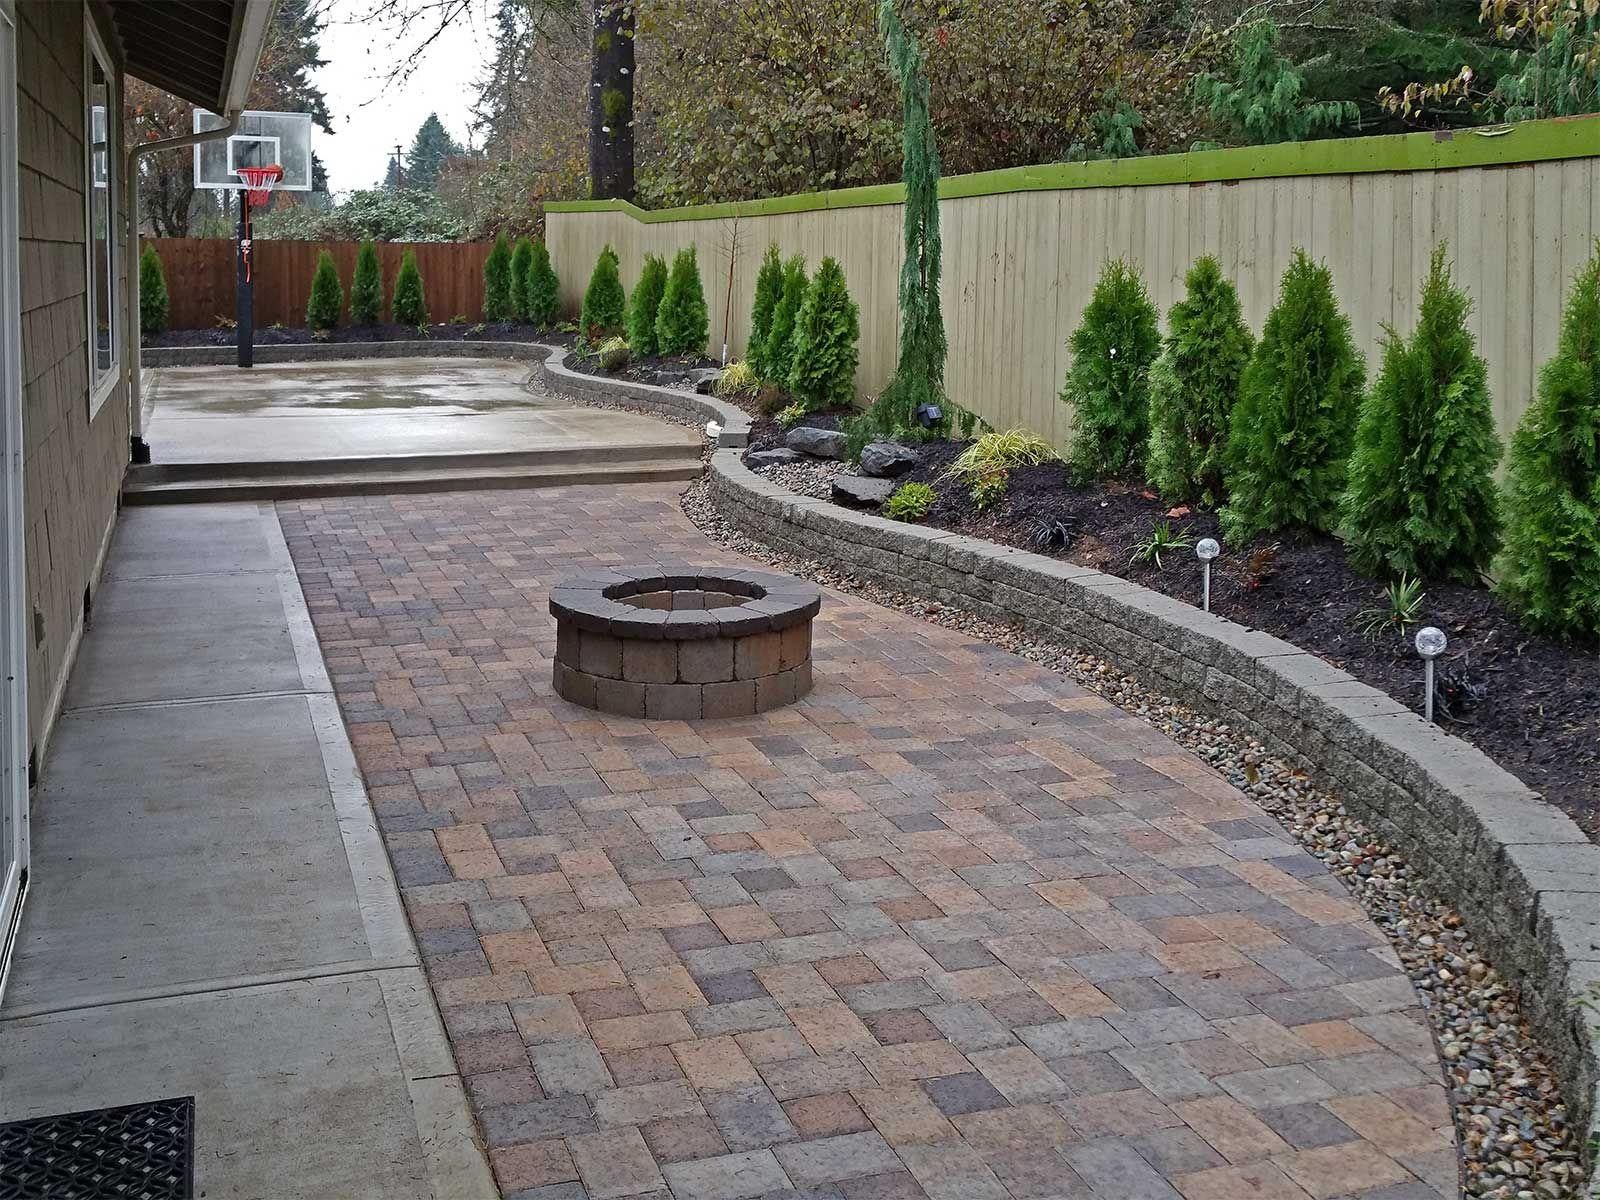 14.SIMPHOME.COM backyard paver patio connected to a concrete slab basketball court